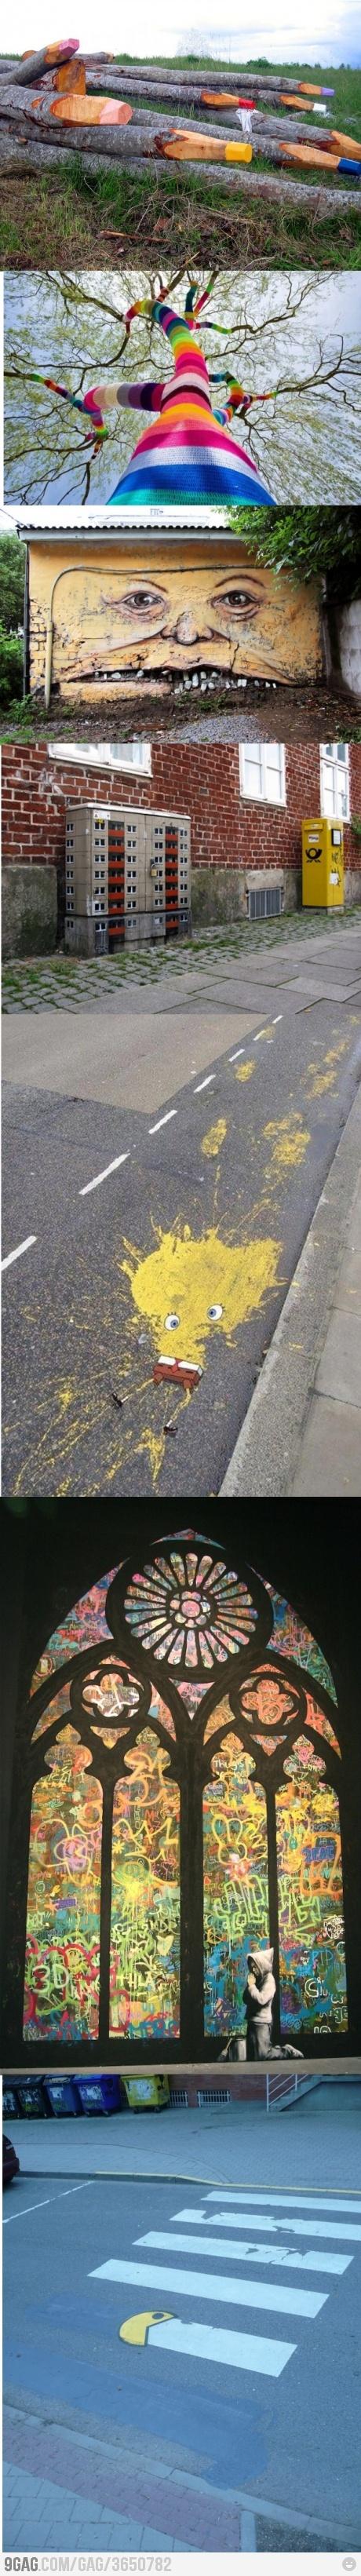 Street art level: 999